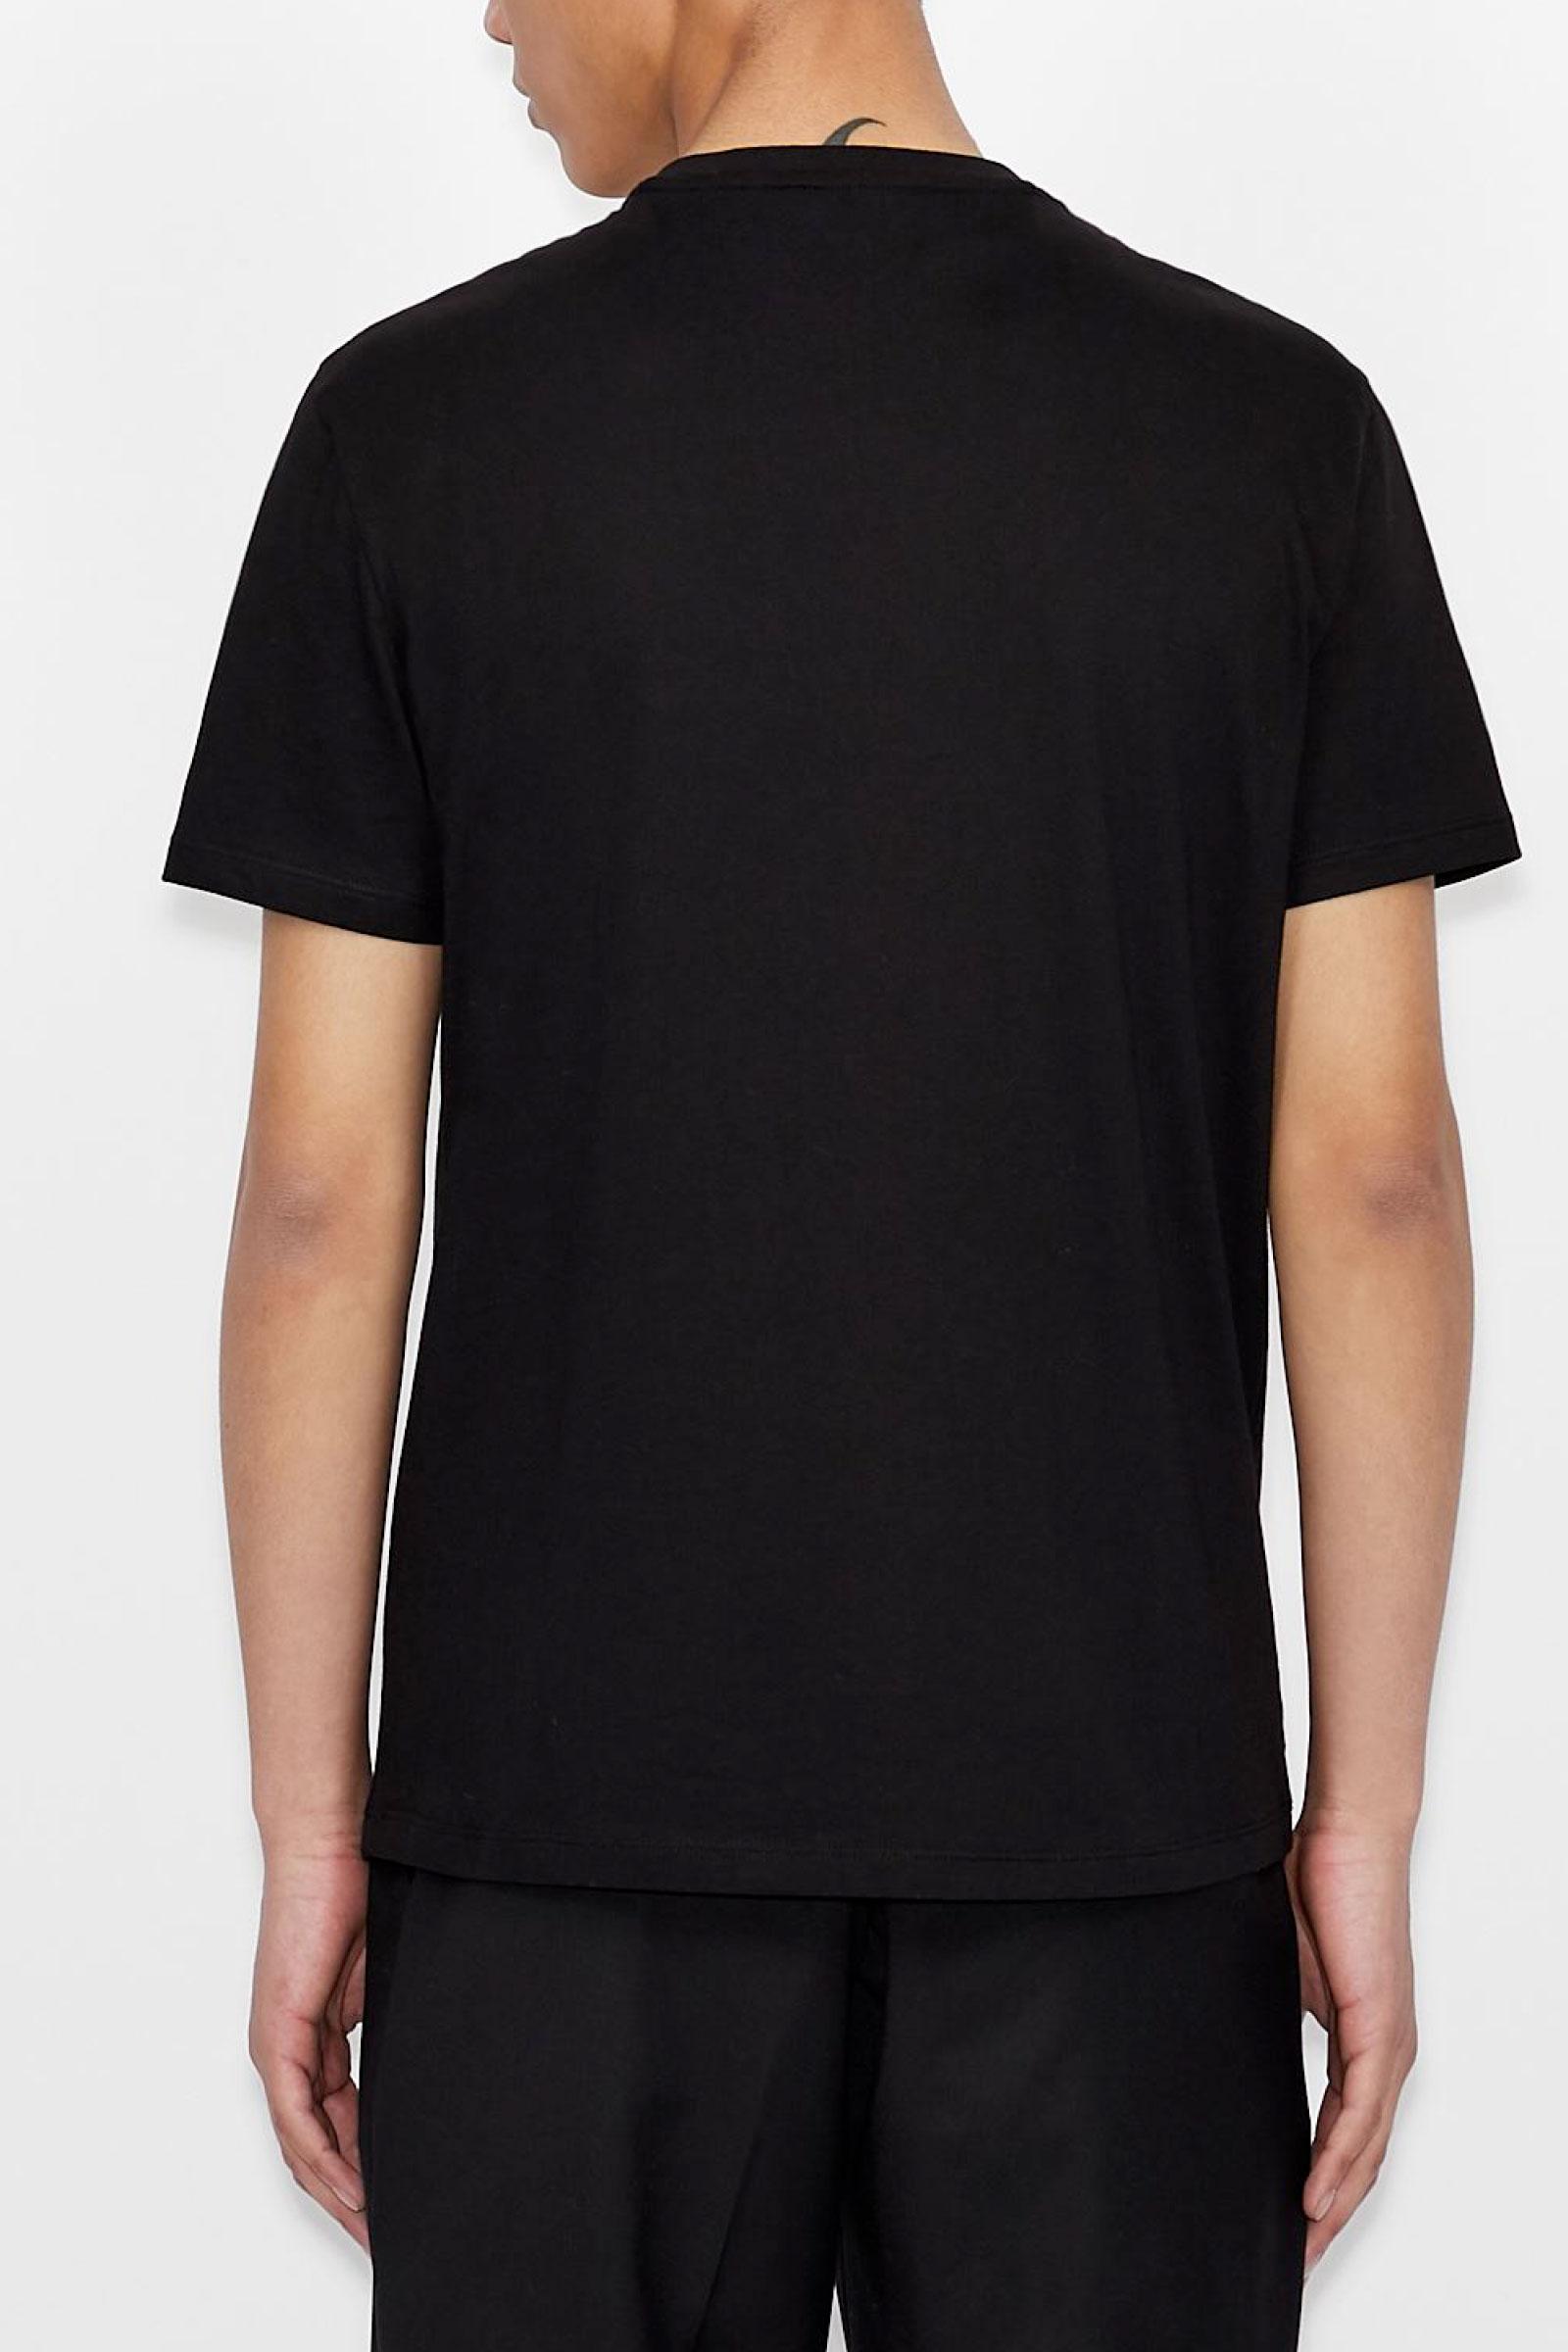 ARMANI EXCHANGE T-Shirt Uomo ARMANI EXCHANGE | T-Shirt | 8NZTPH ZJH4Z1200